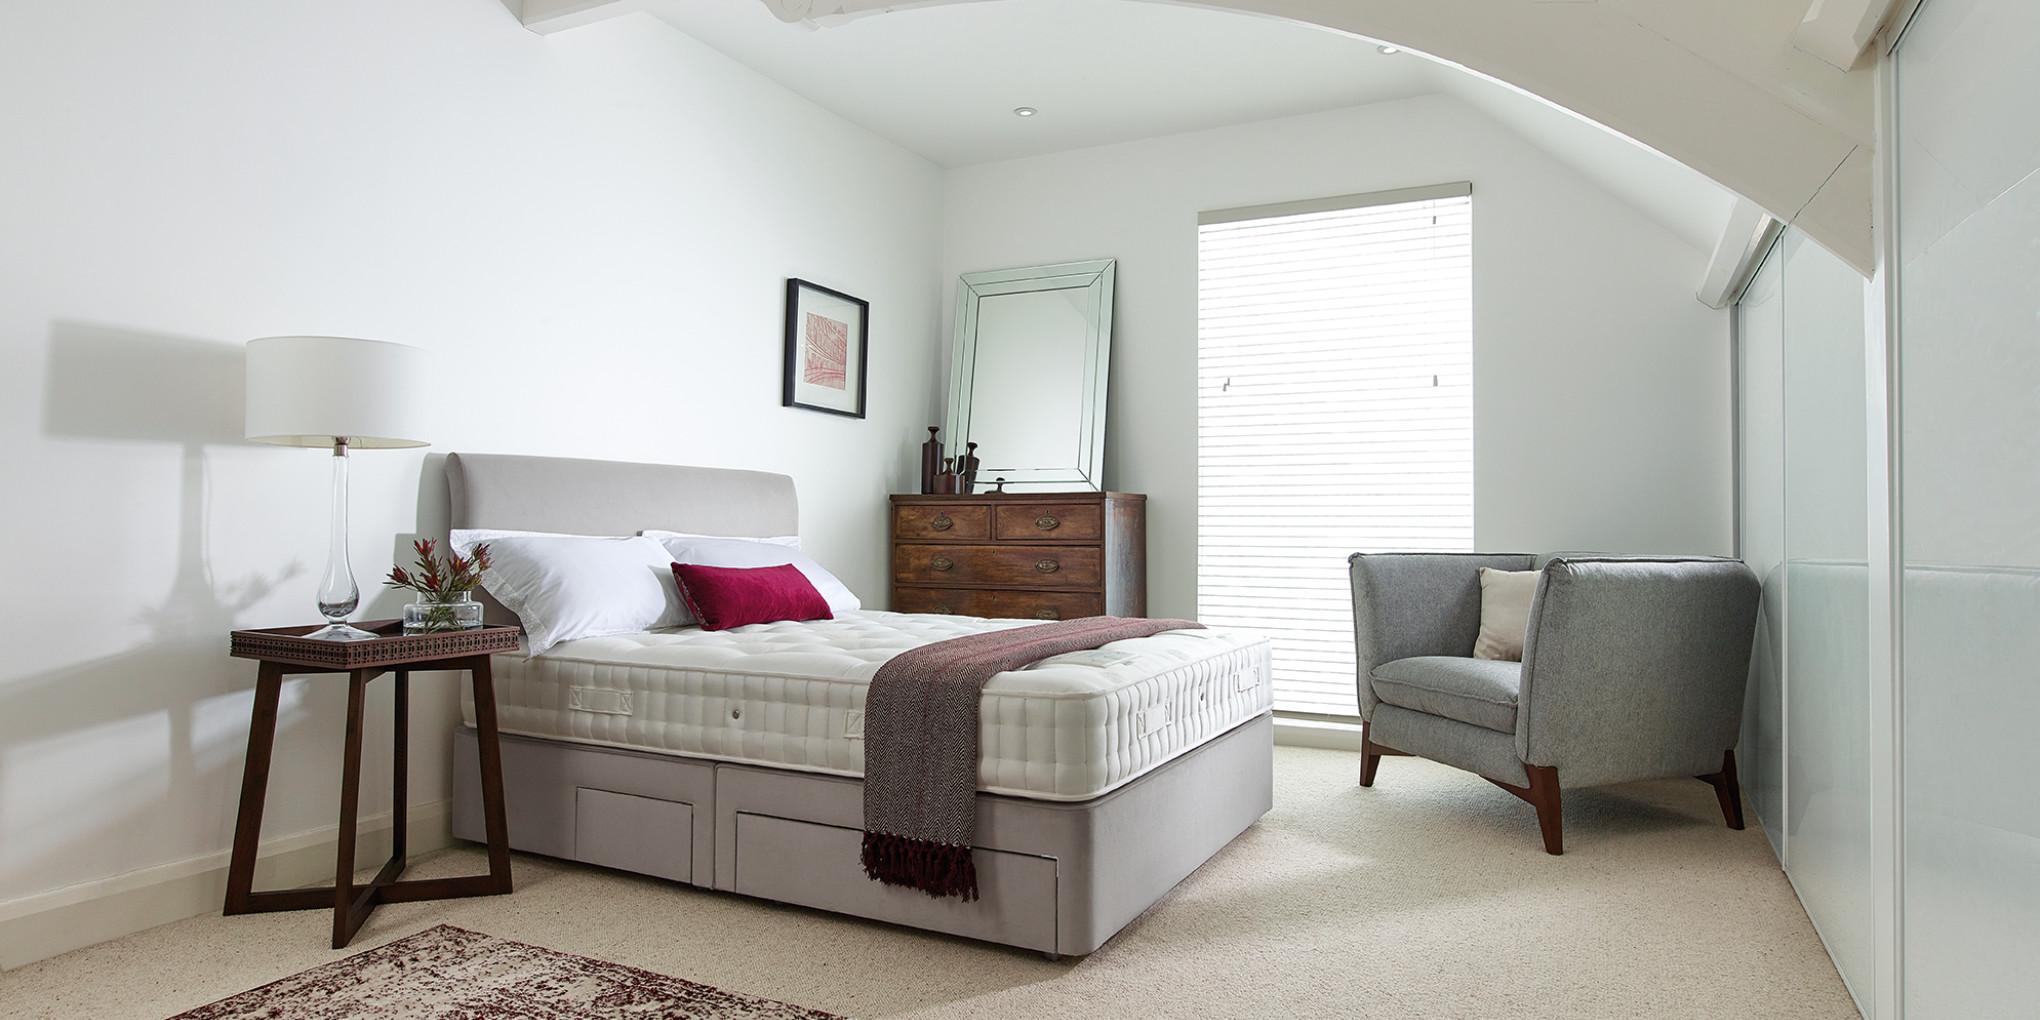 Harrison Bed Tailor Turn Free 2019 Aruba 5200